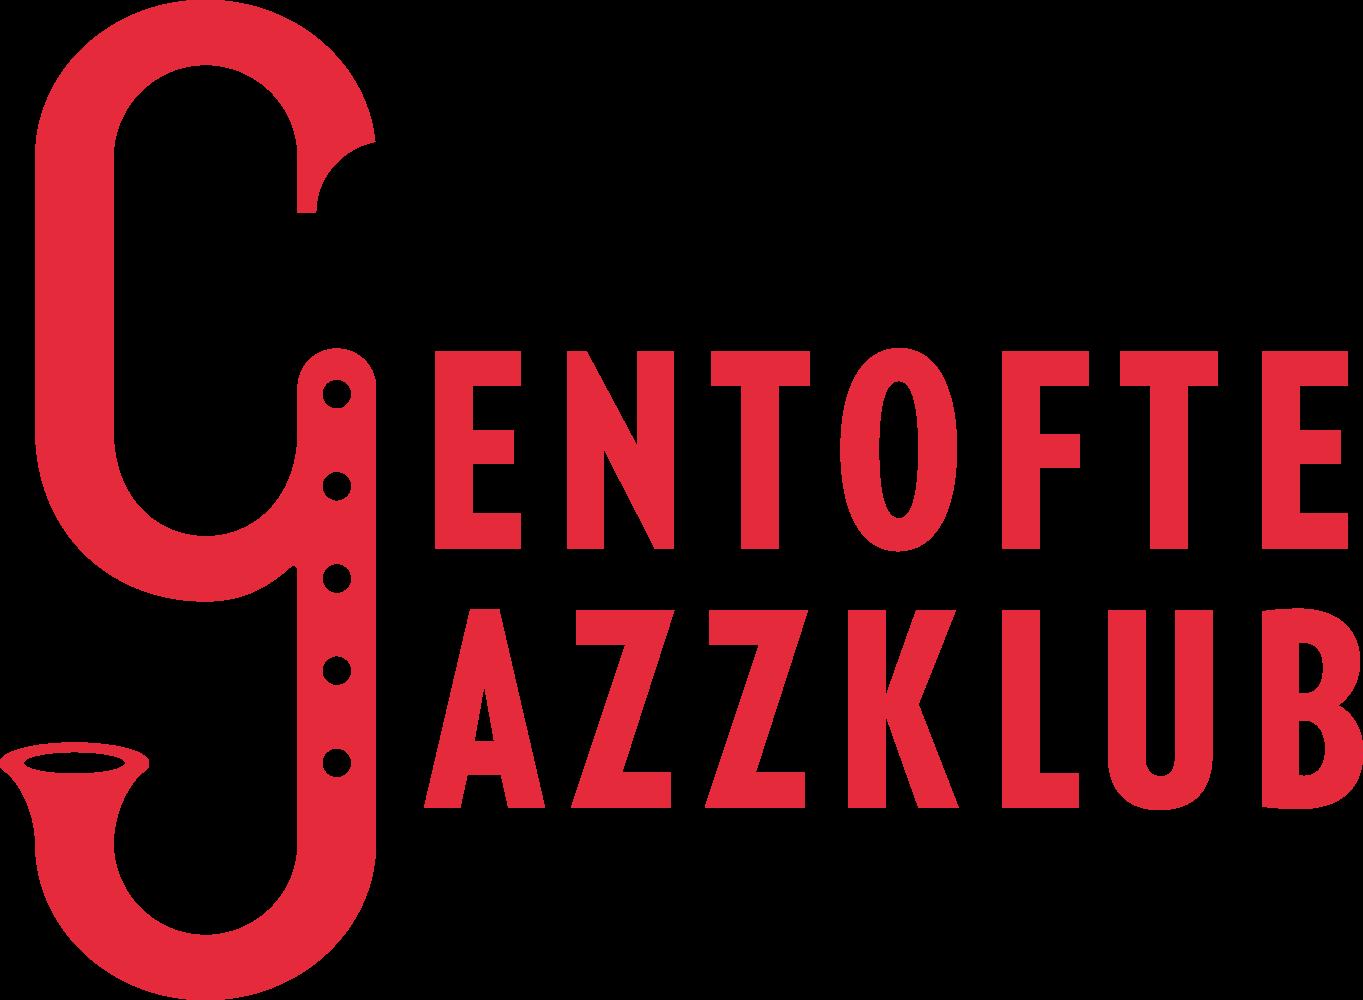 Gentofte Jazzklub